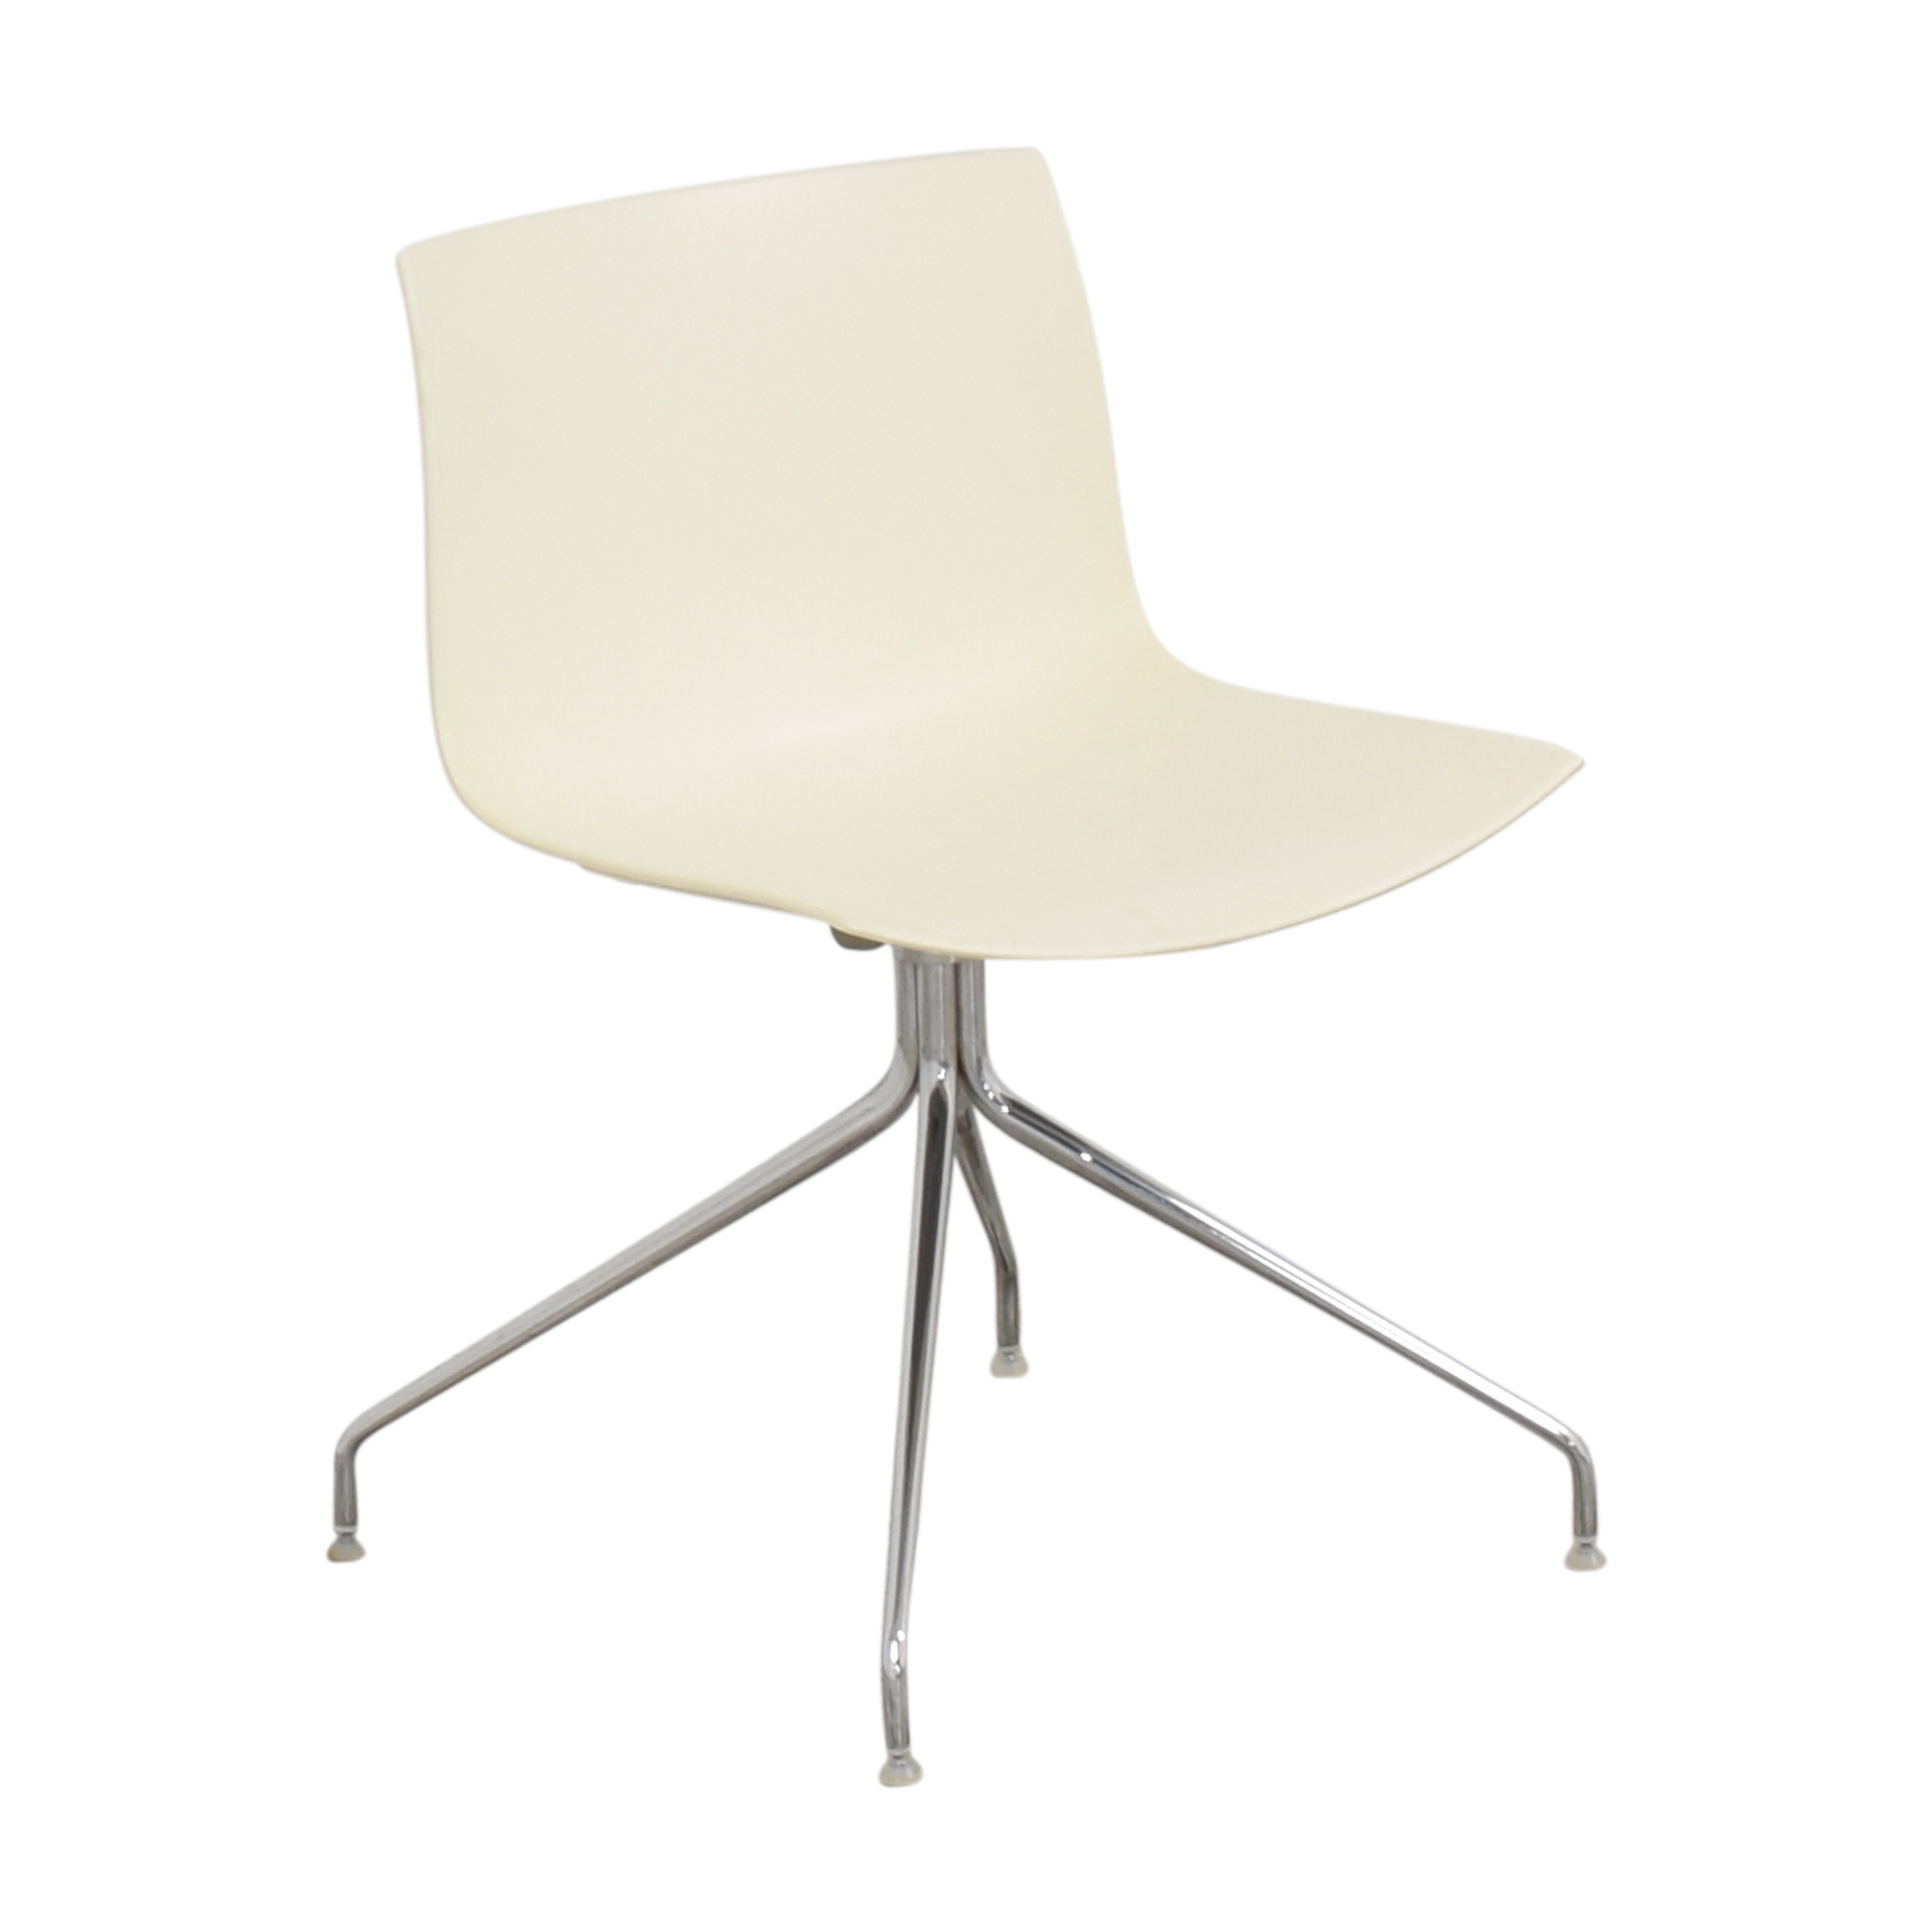 shop Arper Arper Catifa 46 Trestle Swivel Chair online